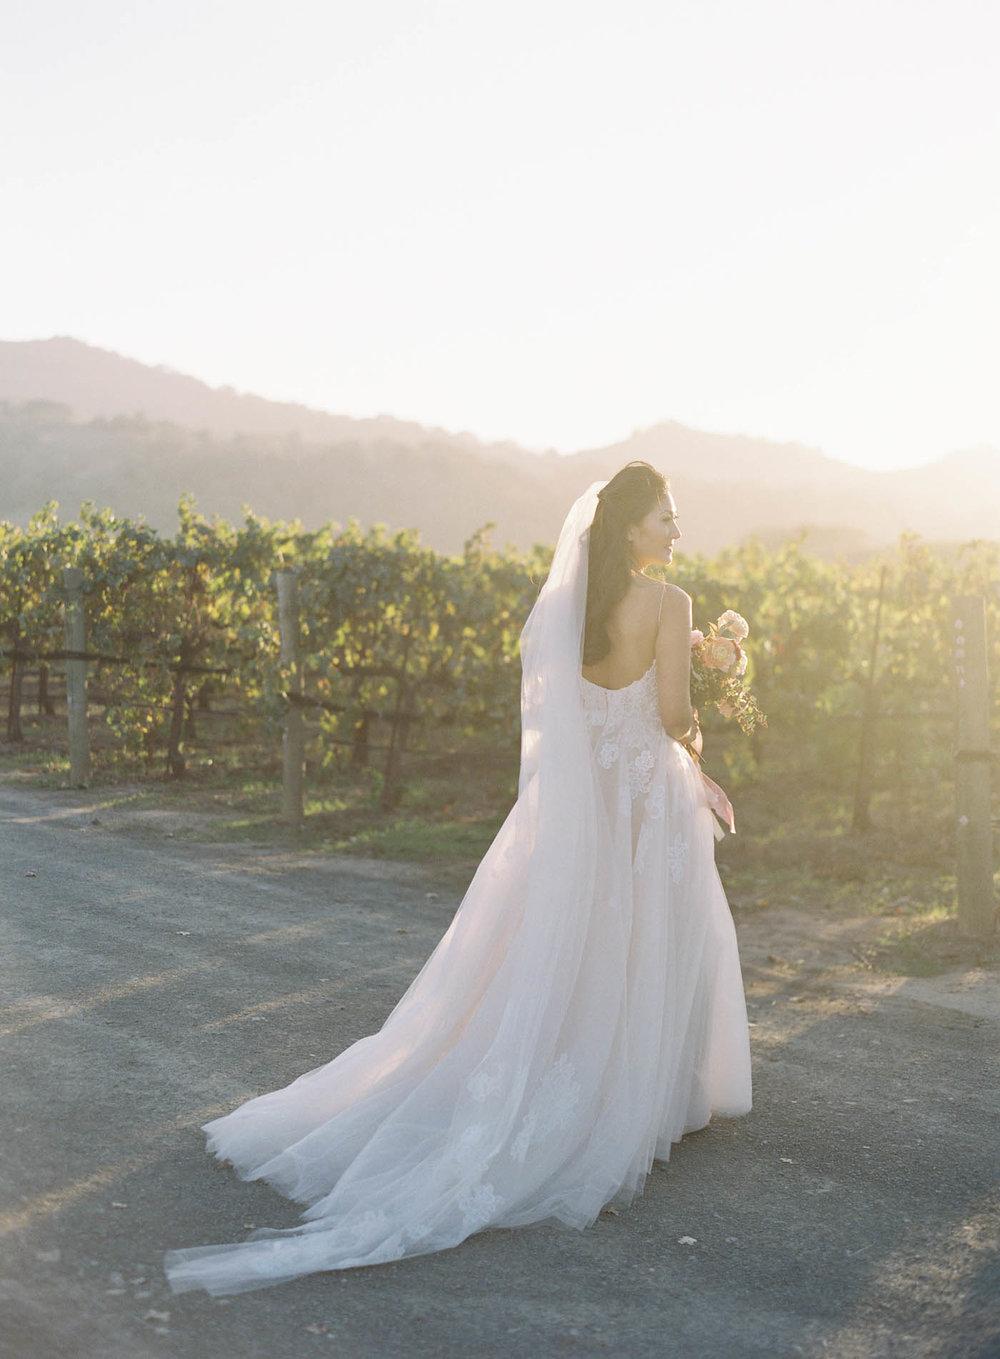 sunstone-villa-wedding-20-Jen_Huang-RD-112-Jen_Huang-009586-R1-012.jpg